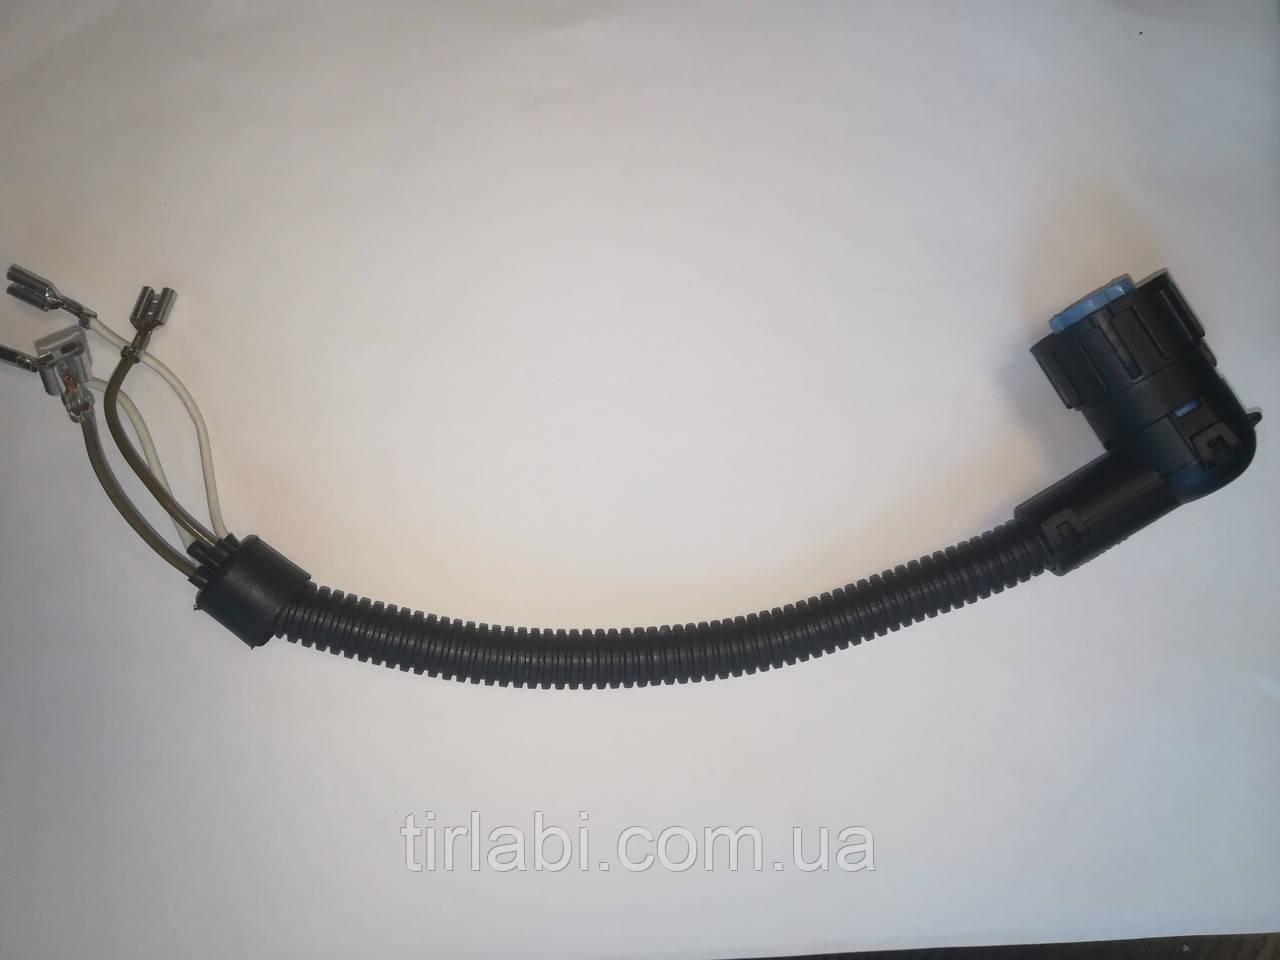 Кабель байонет крана 4pin кабель Bajonet 24V кпп ZF клапан фишка